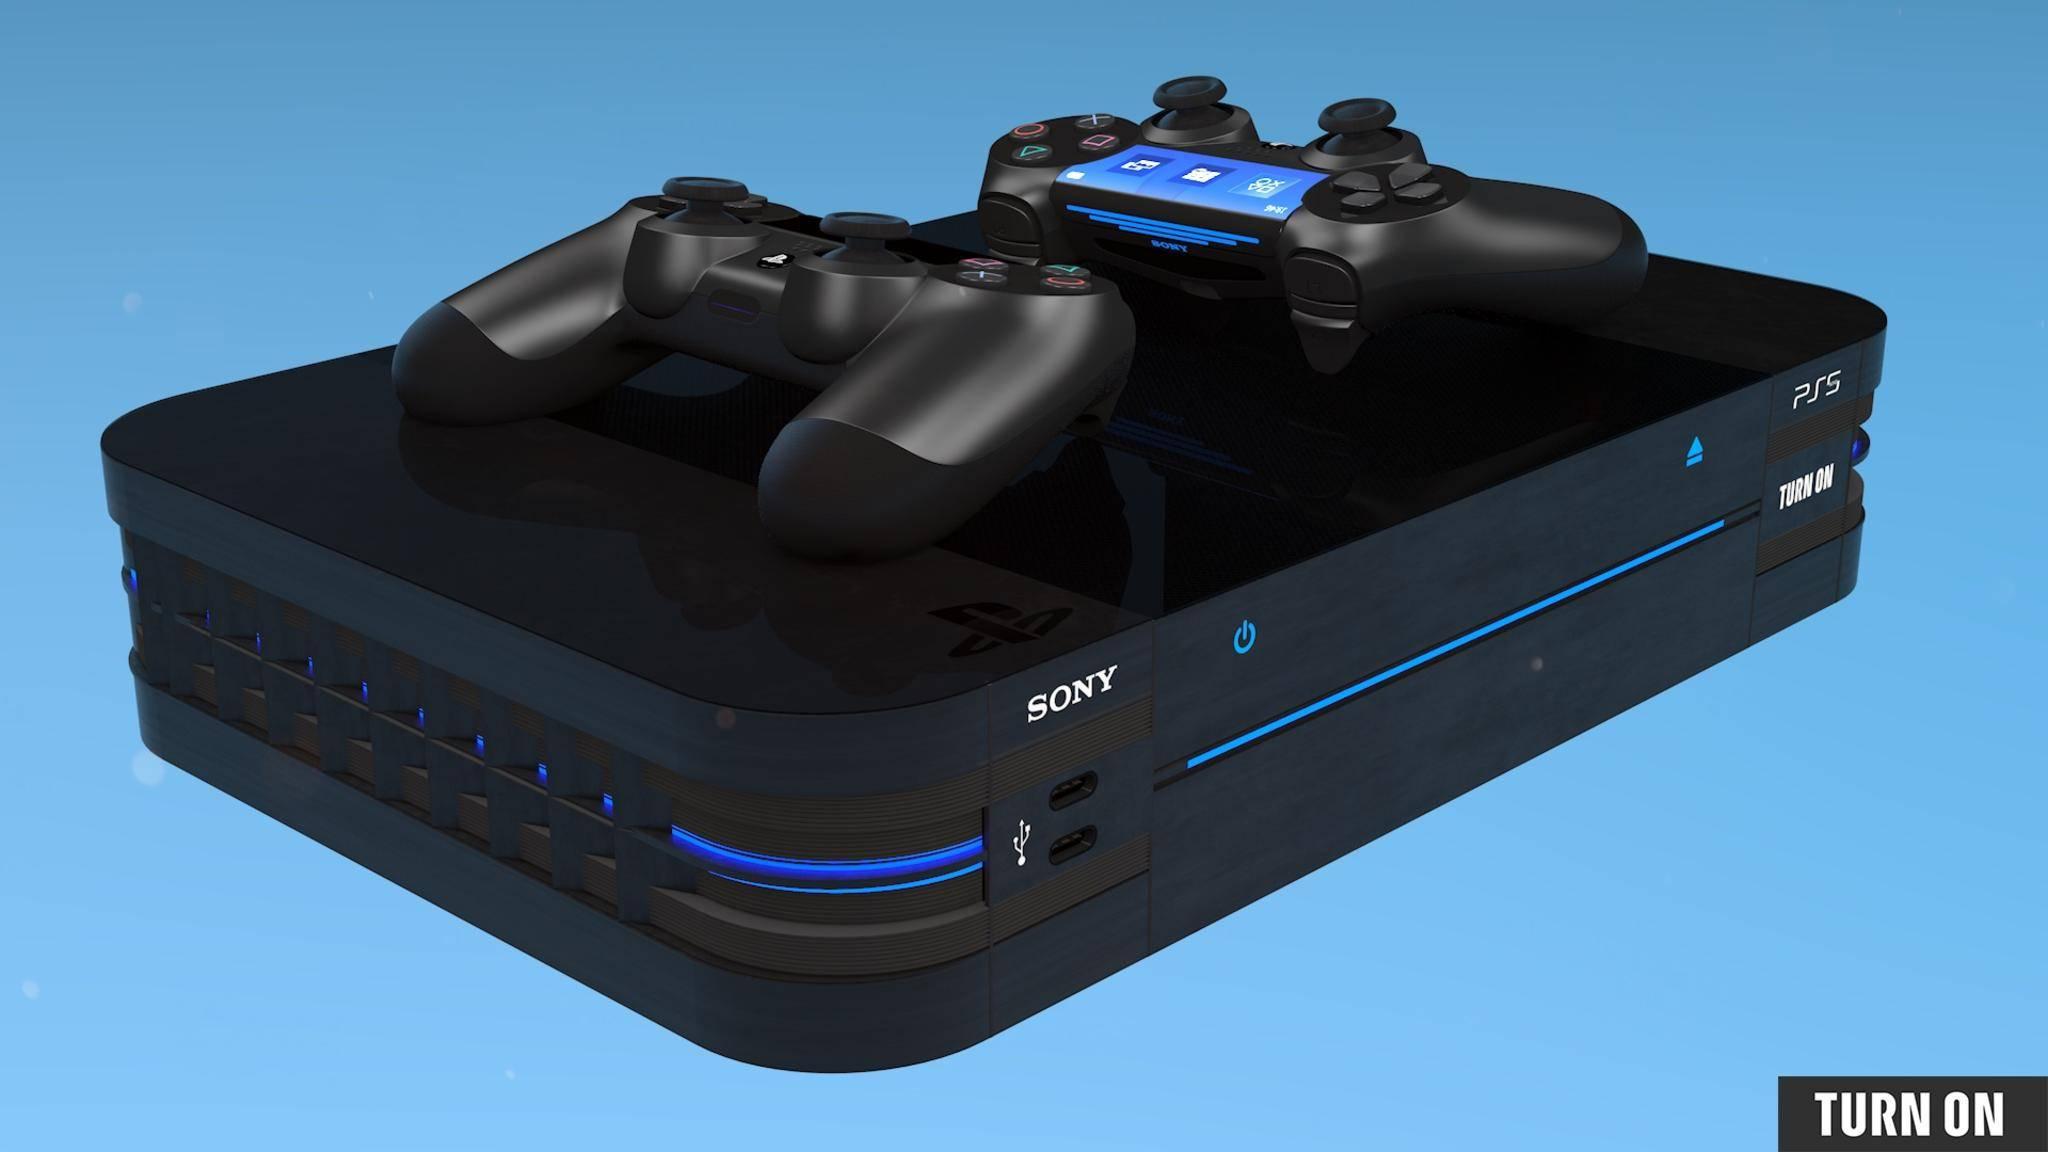 ps5-playstation-5-konzept-turn-on-konsole-main